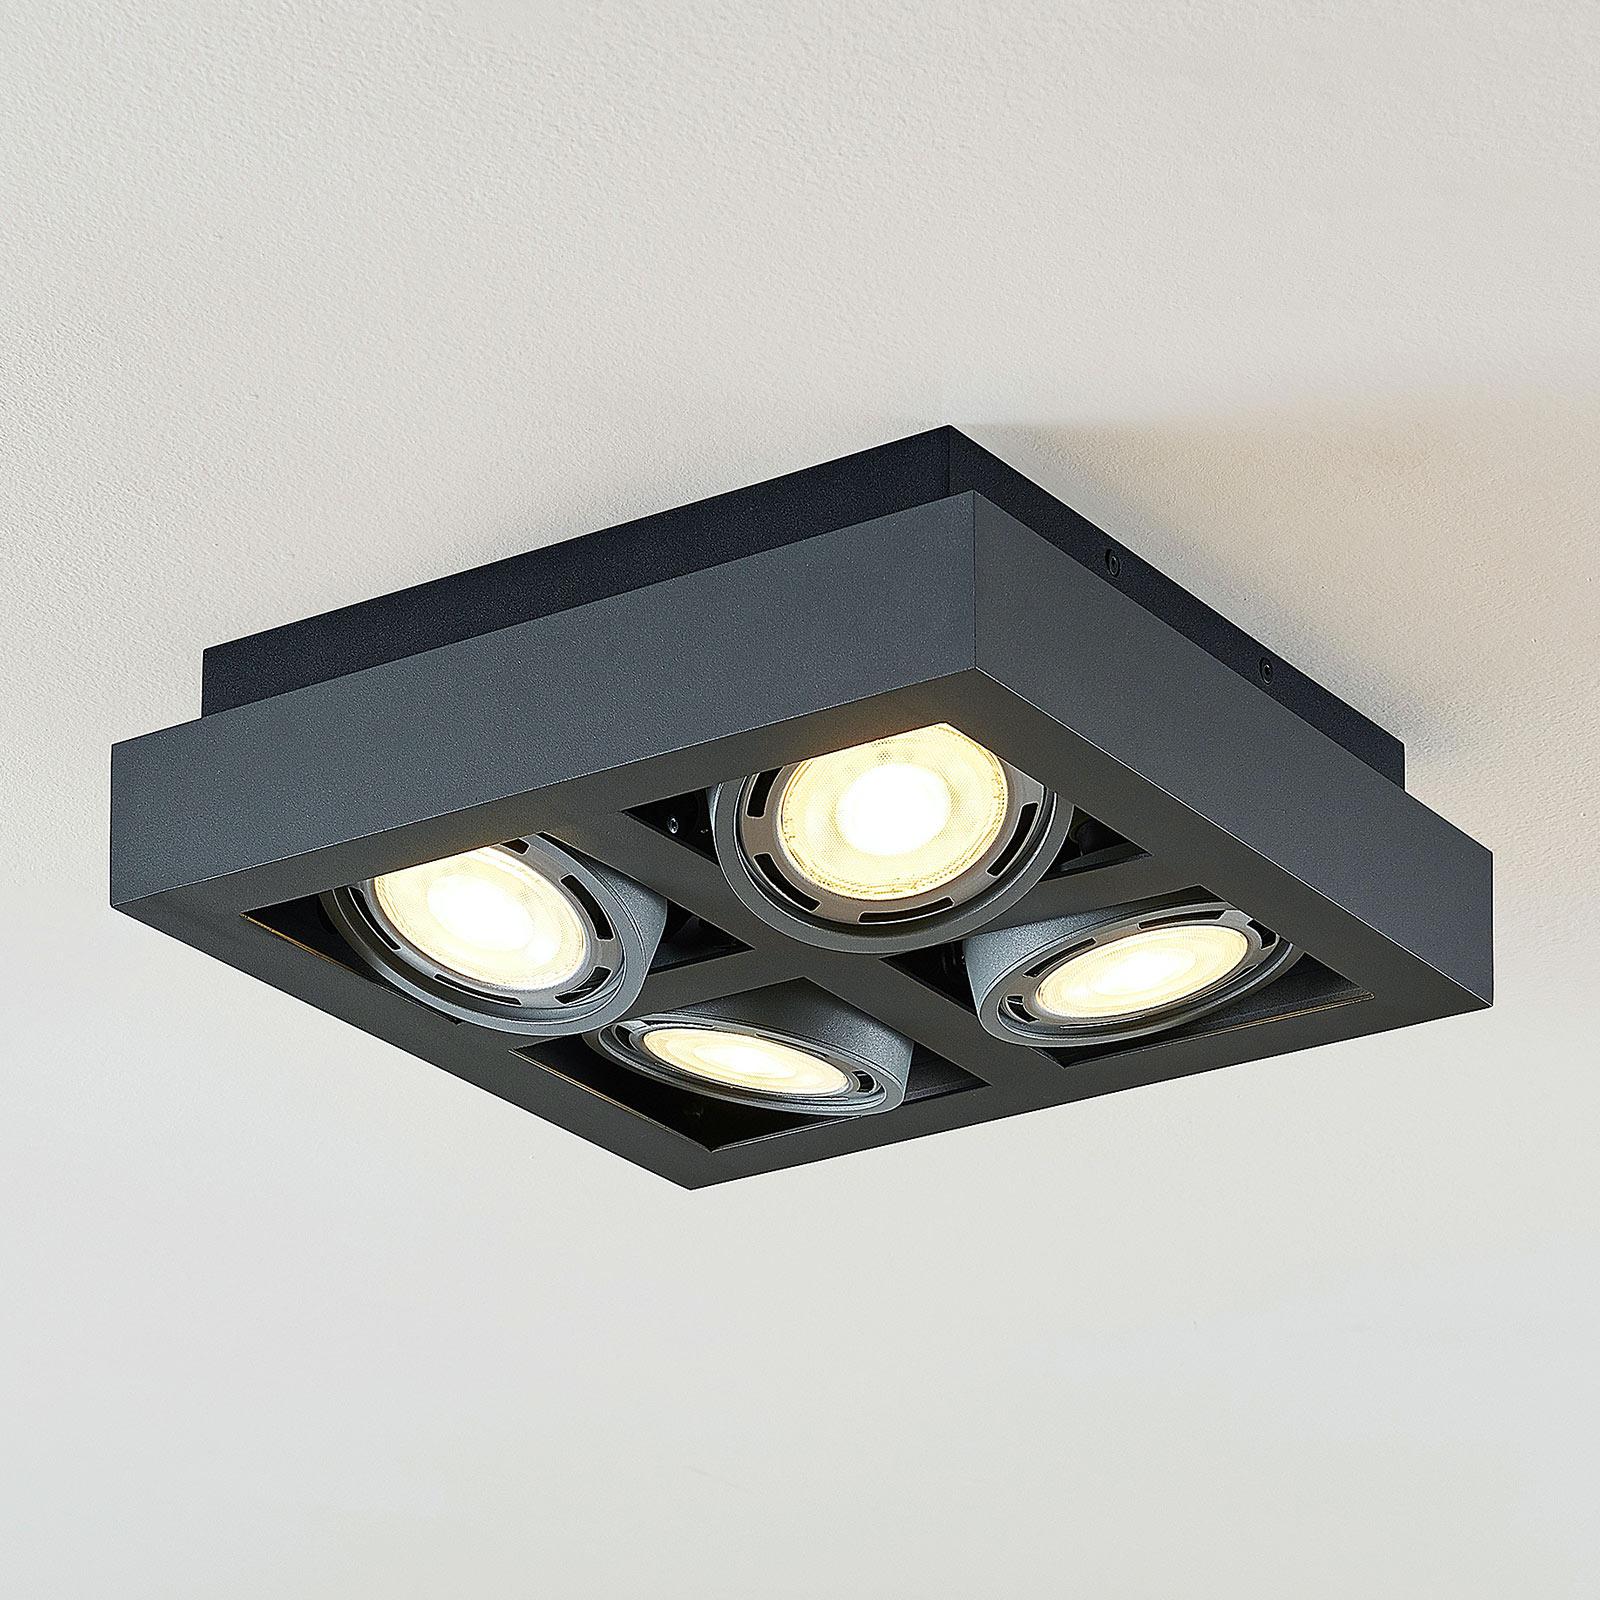 LED-Deckenstrahler Ronka, 4-fl., quadratisch, grau